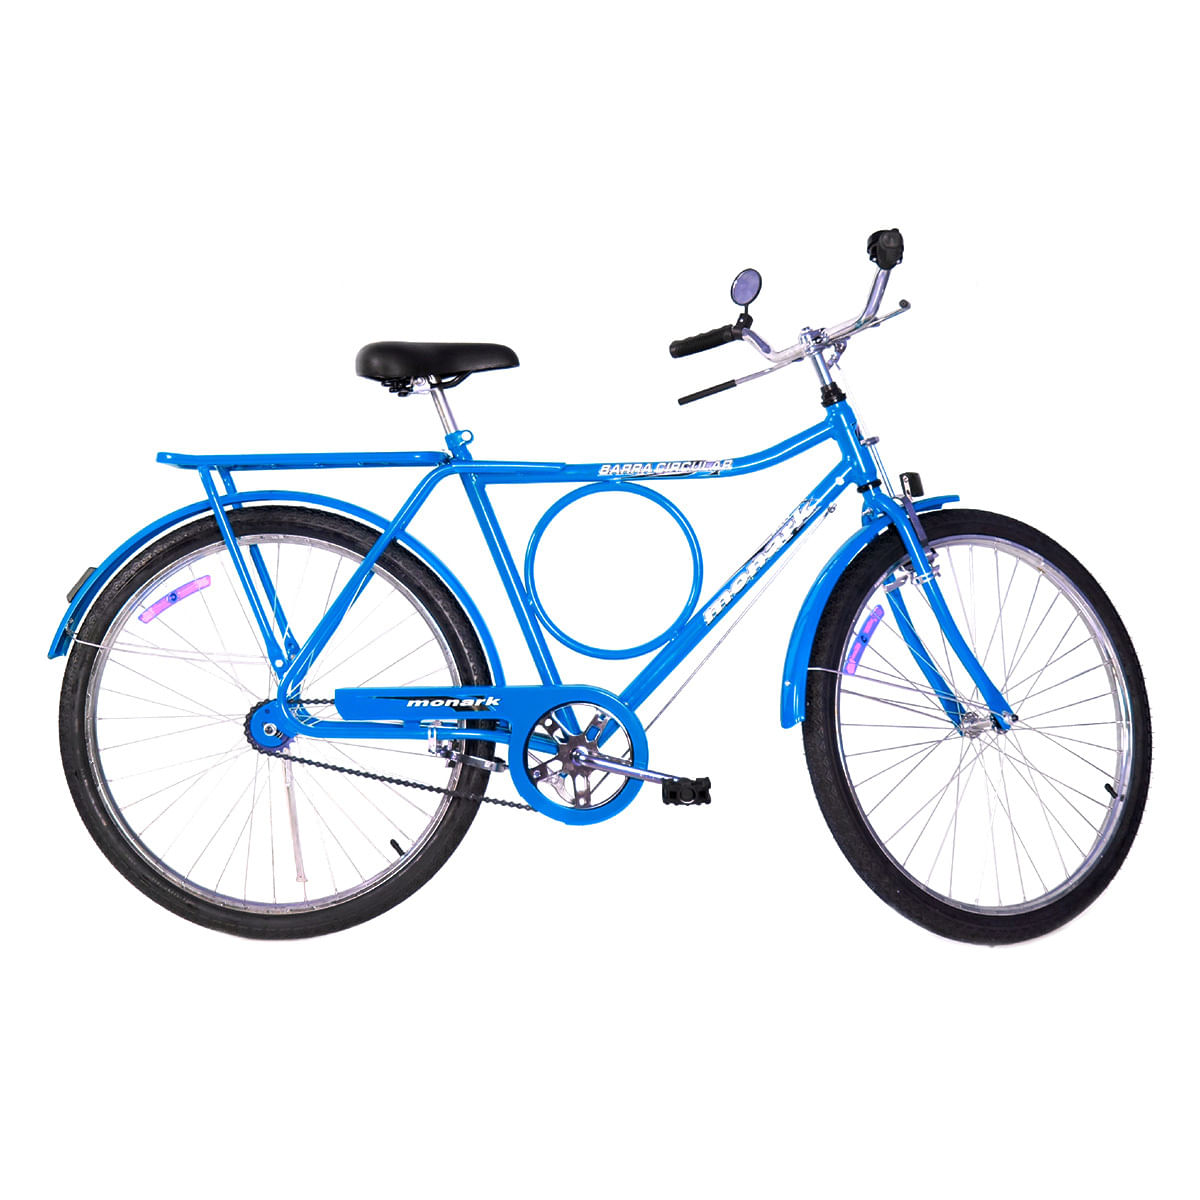 Imagem de Bicicleta Aro 26 Barra Circular Fi Lazer Monark